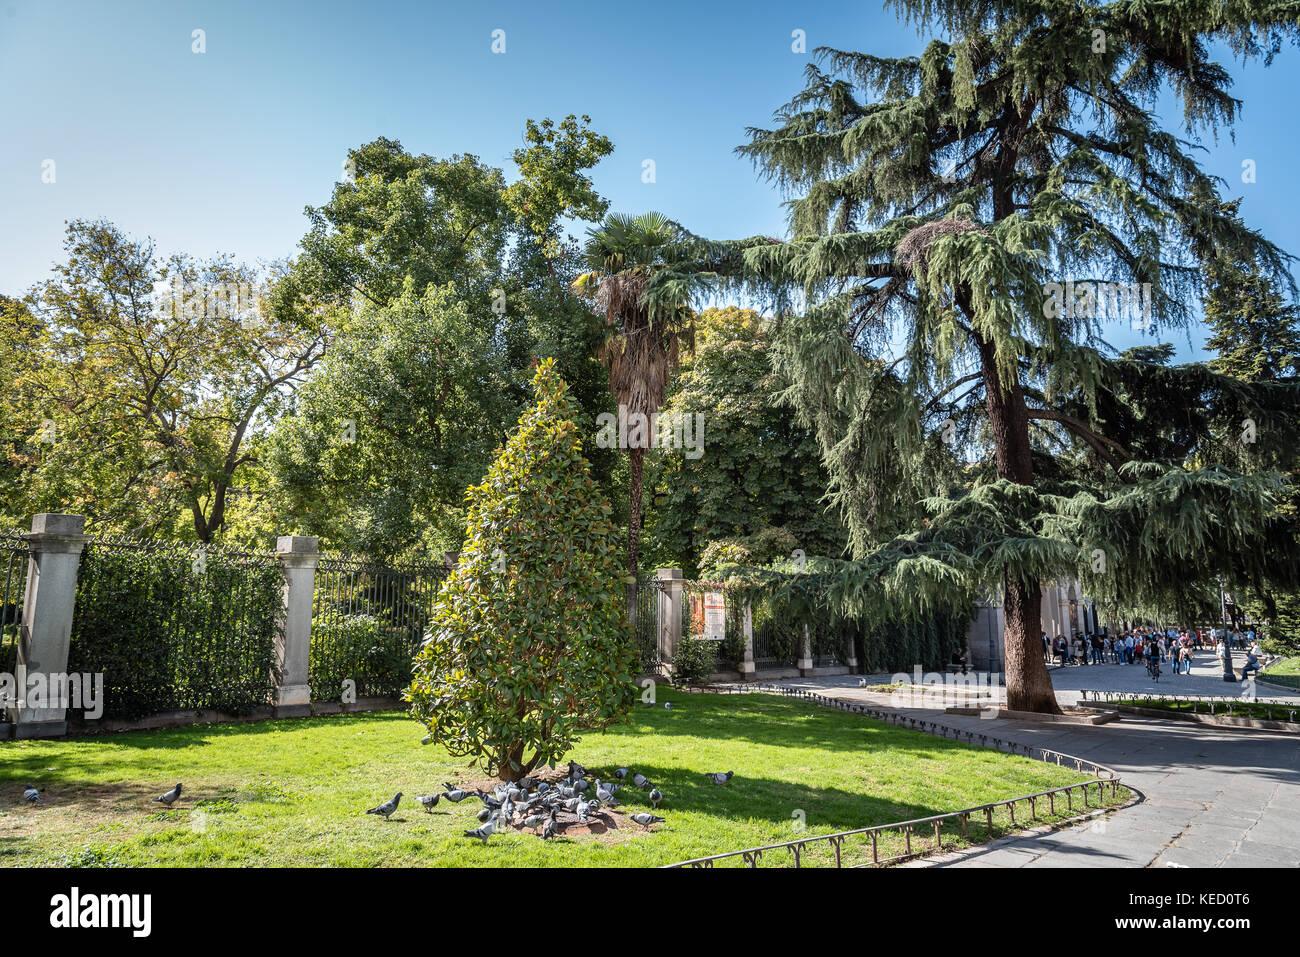 sabatini garden stockfotos sabatini garden bilder alamy. Black Bedroom Furniture Sets. Home Design Ideas